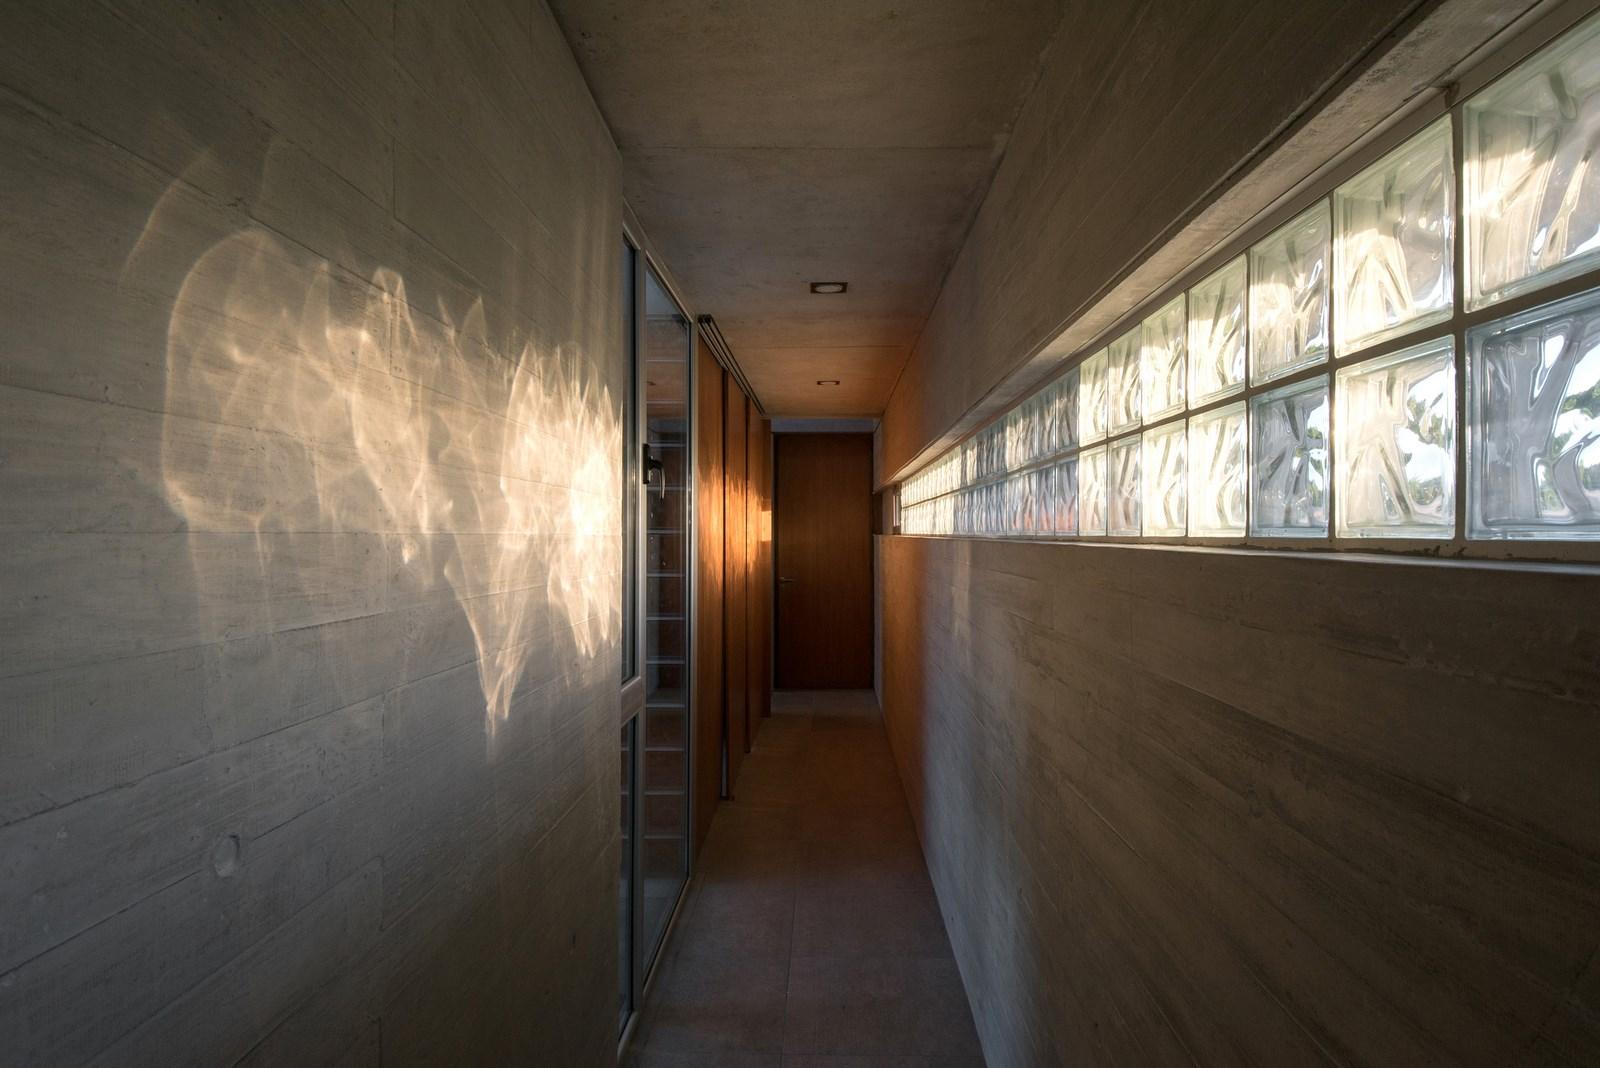 Casa AYYA - Estudio Galera - Foto © Diego Medina 101 (Copy)